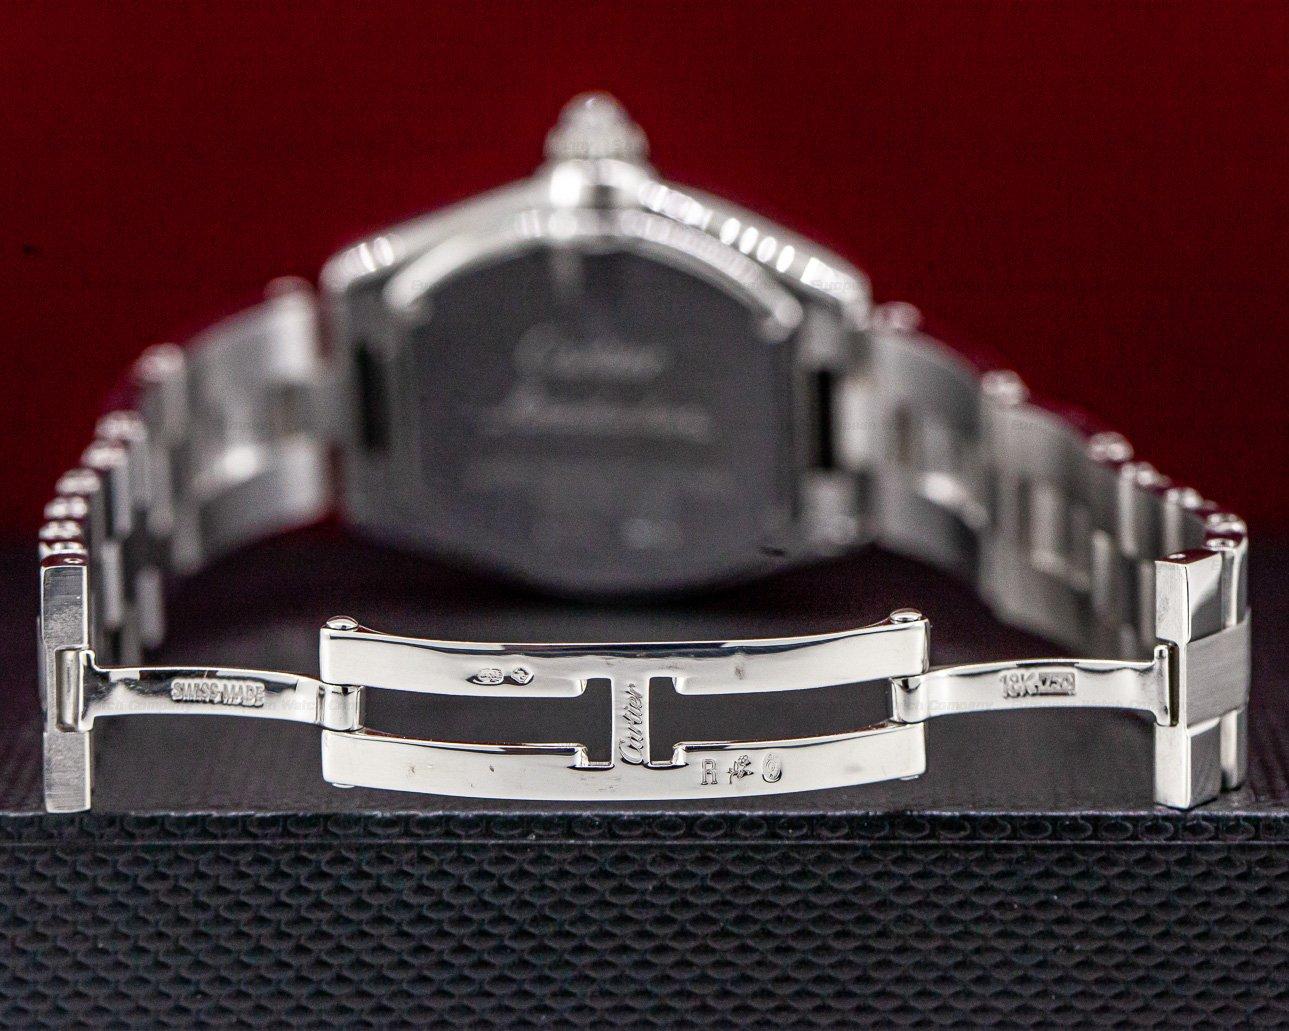 Cartier WE5002X2 Roadster Ladies 18K White Gold Diamond Bezel